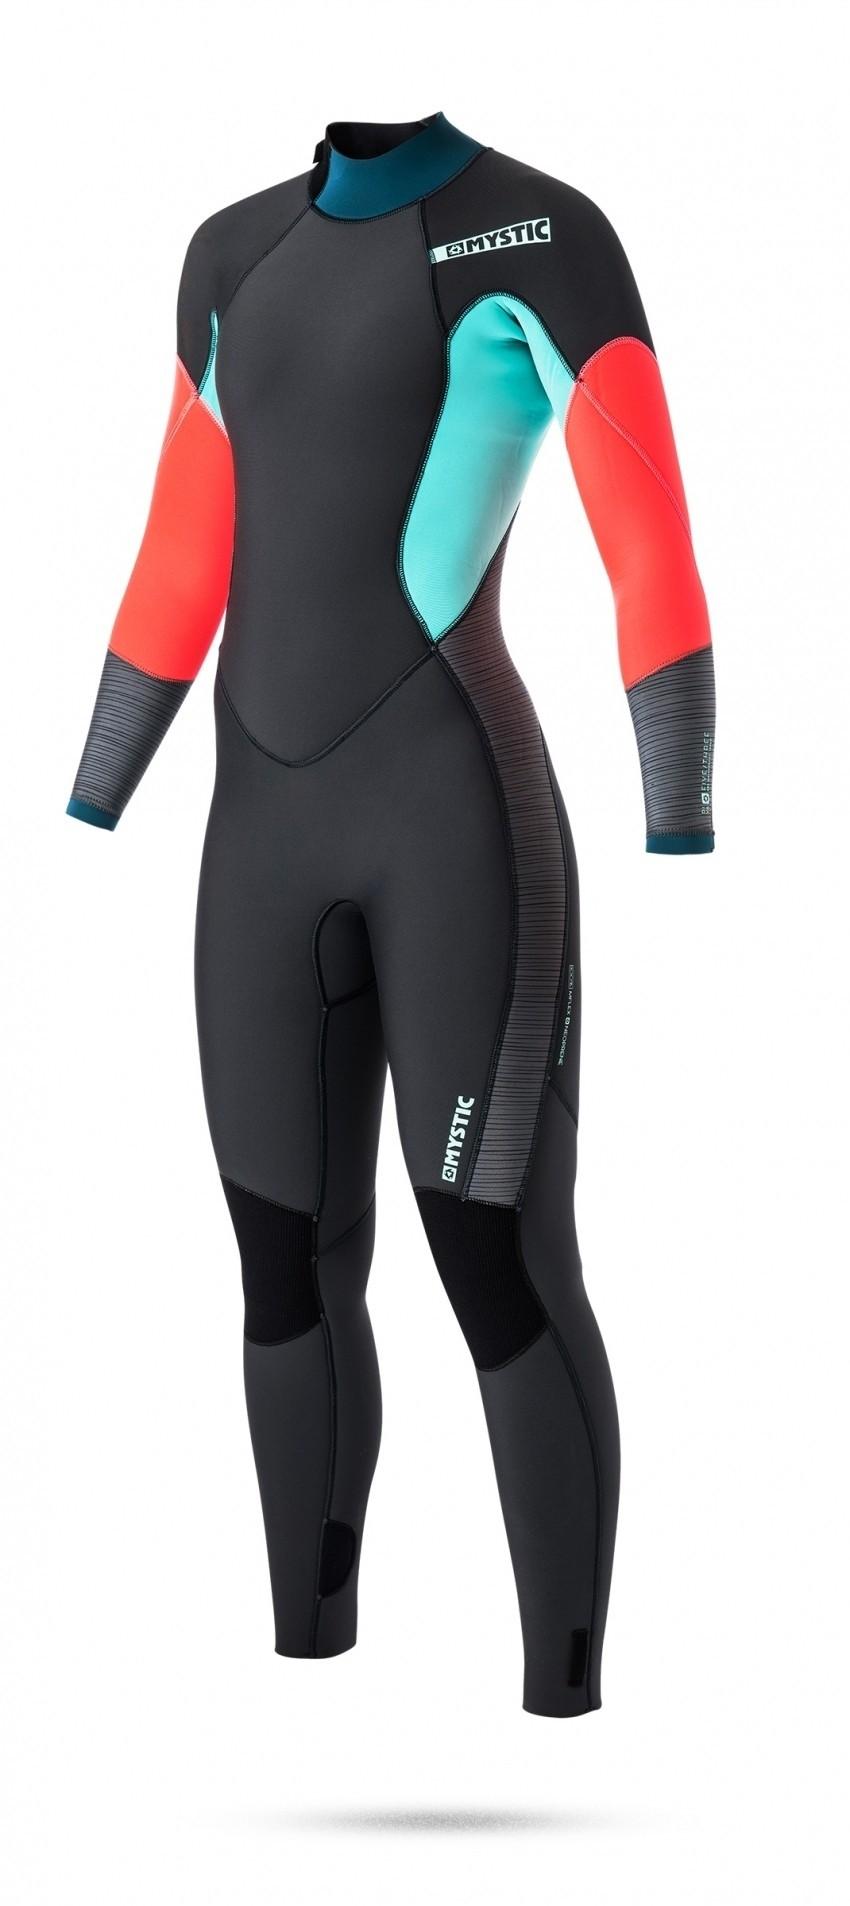 Mystic dames wetsuit Diva 5/3 2017